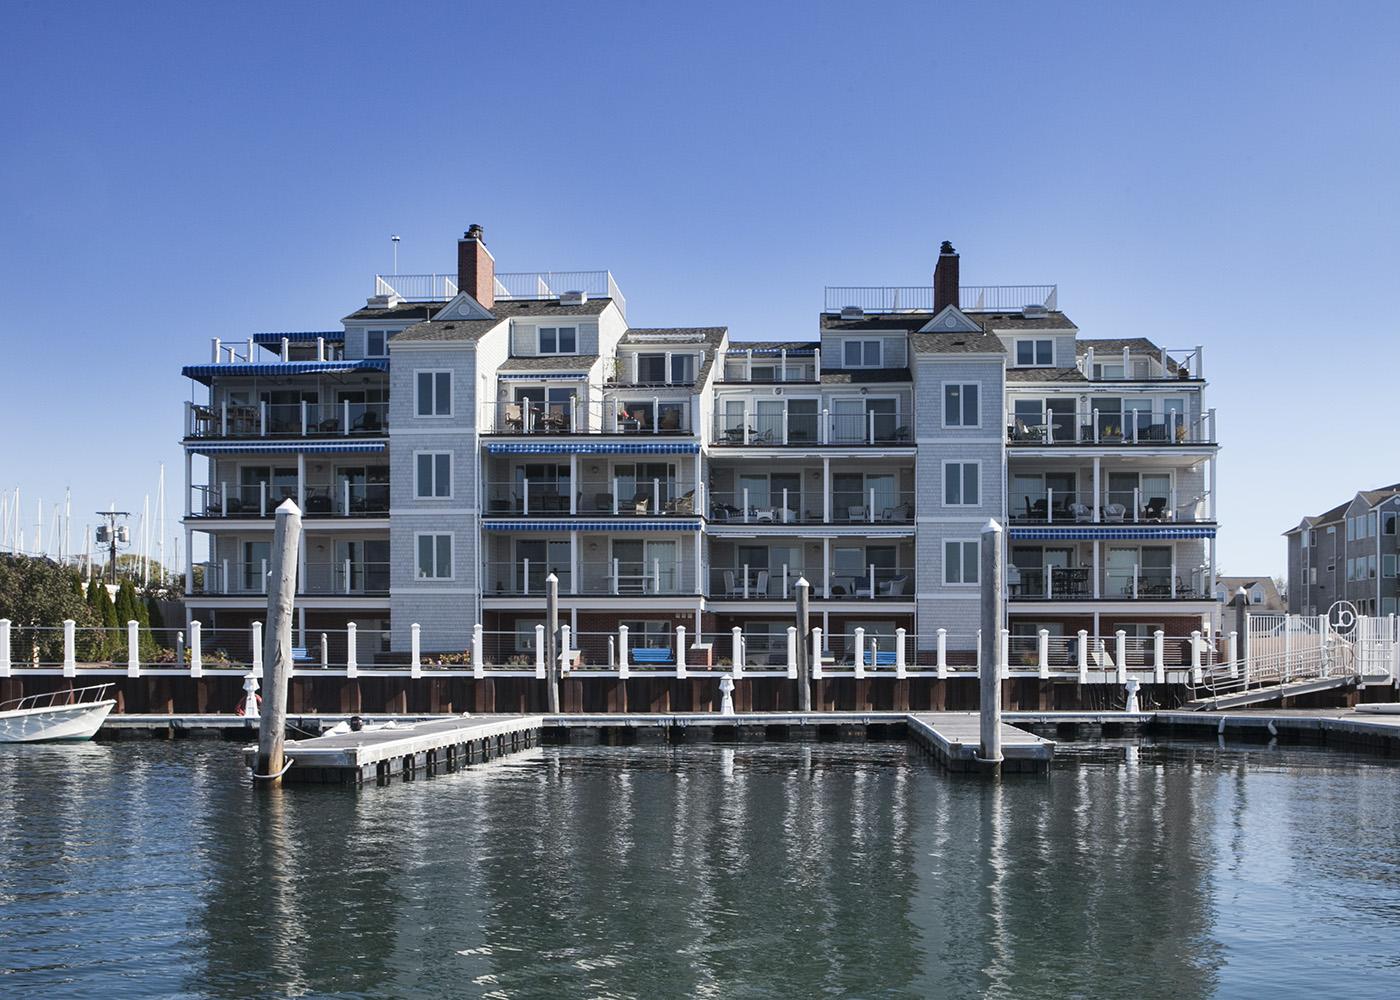 Condominium for Sale at Coddington Landing 31 Coddington Wharf 21 Newport, Rhode Island, 02840 United States